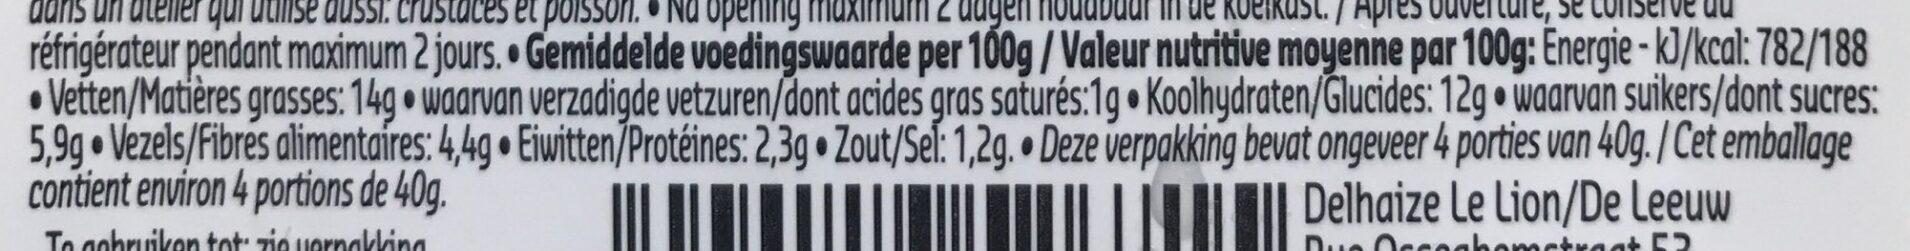 Quinoa salade au curry veggie - Voedingswaarden